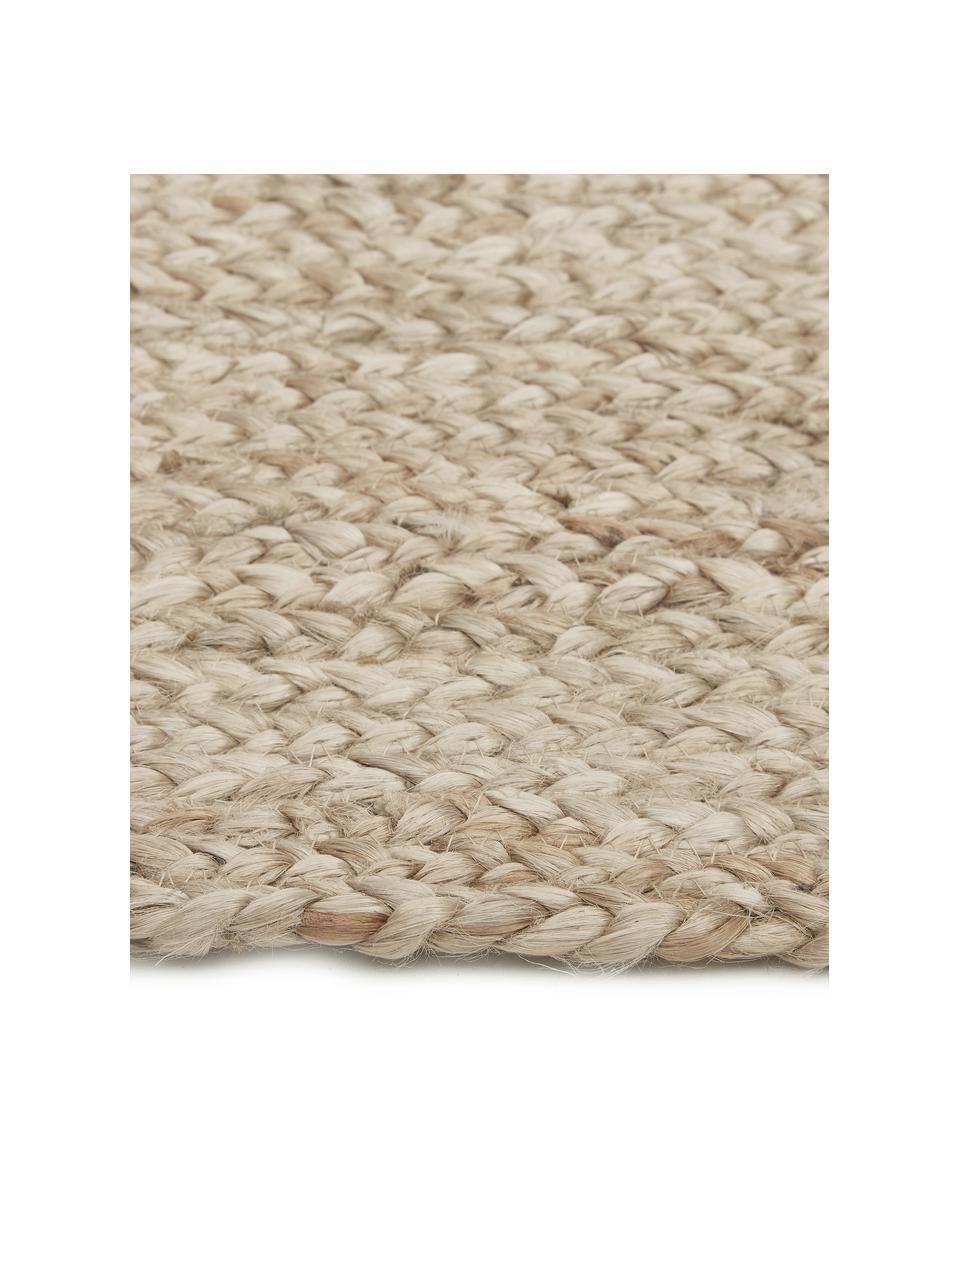 Handgefertigter Jute-Teppich Sharmila, Beige, B 300 x L 400 cm (Grösse XL)